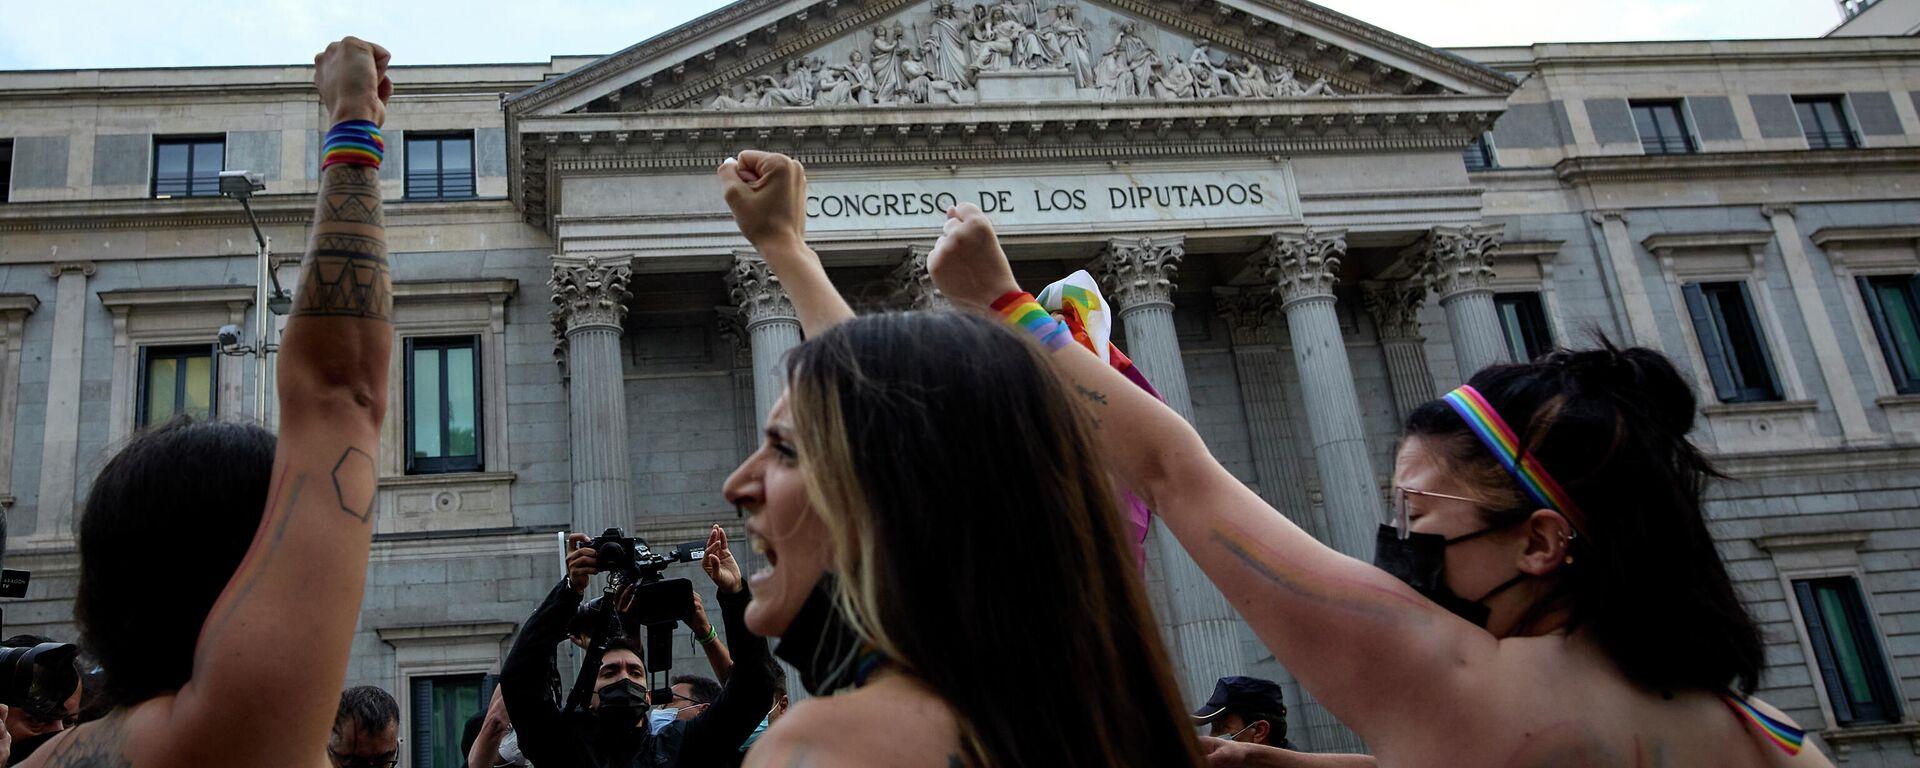 Femen se manifiesta contra la homofobia - Sputnik Mundo, 1920, 16.09.2021